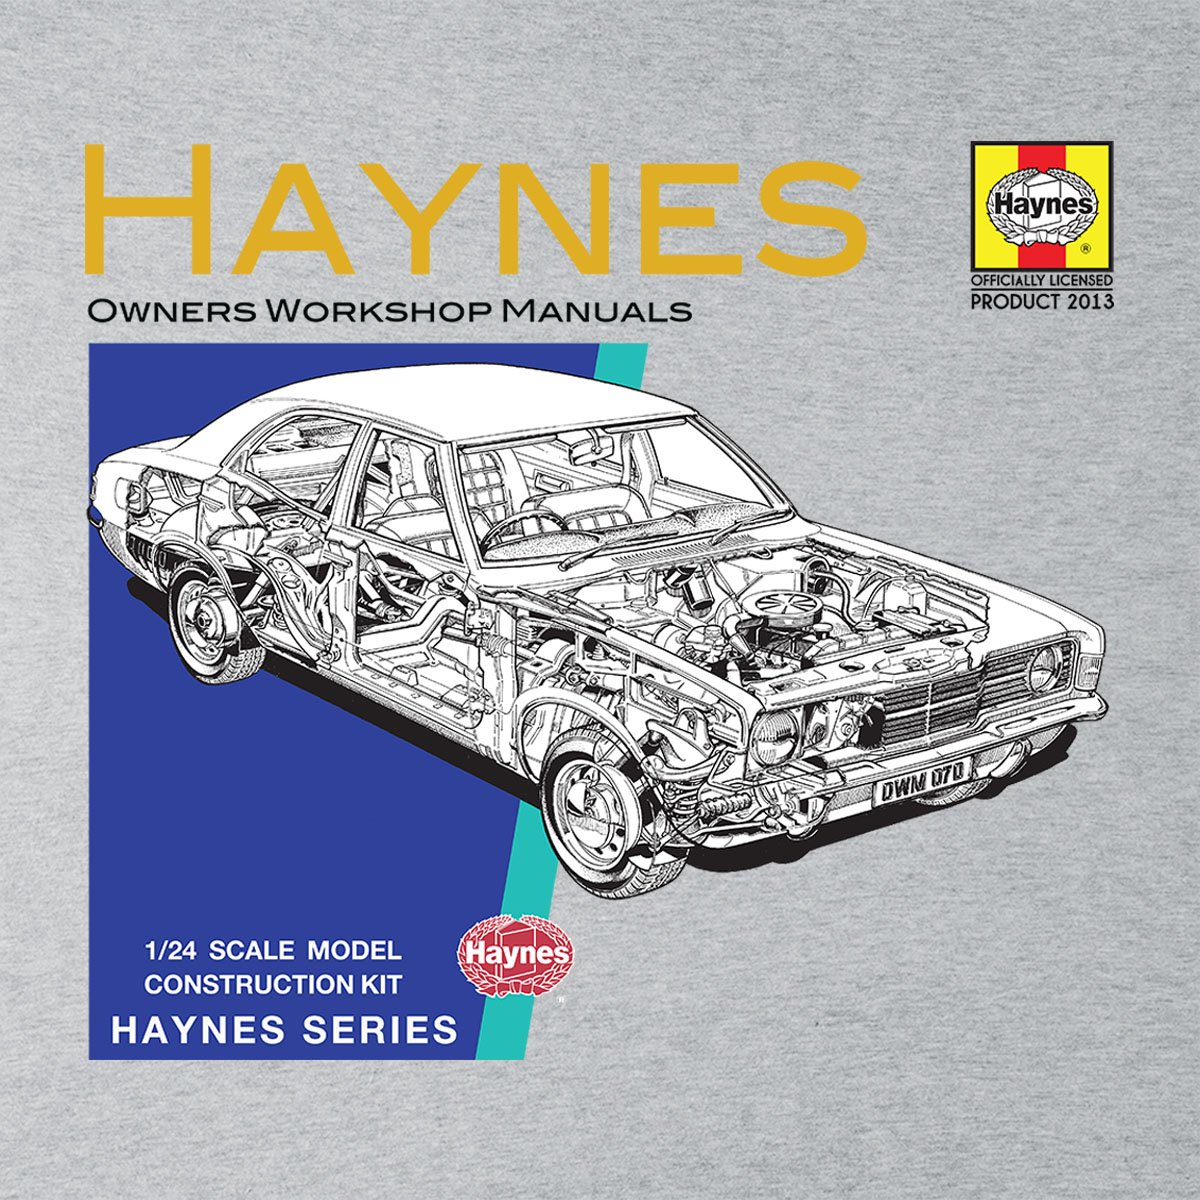 Haynes Owners Workshop Manual 0070 Ford Cortina Mk3 Men's Vest | Amazon.com